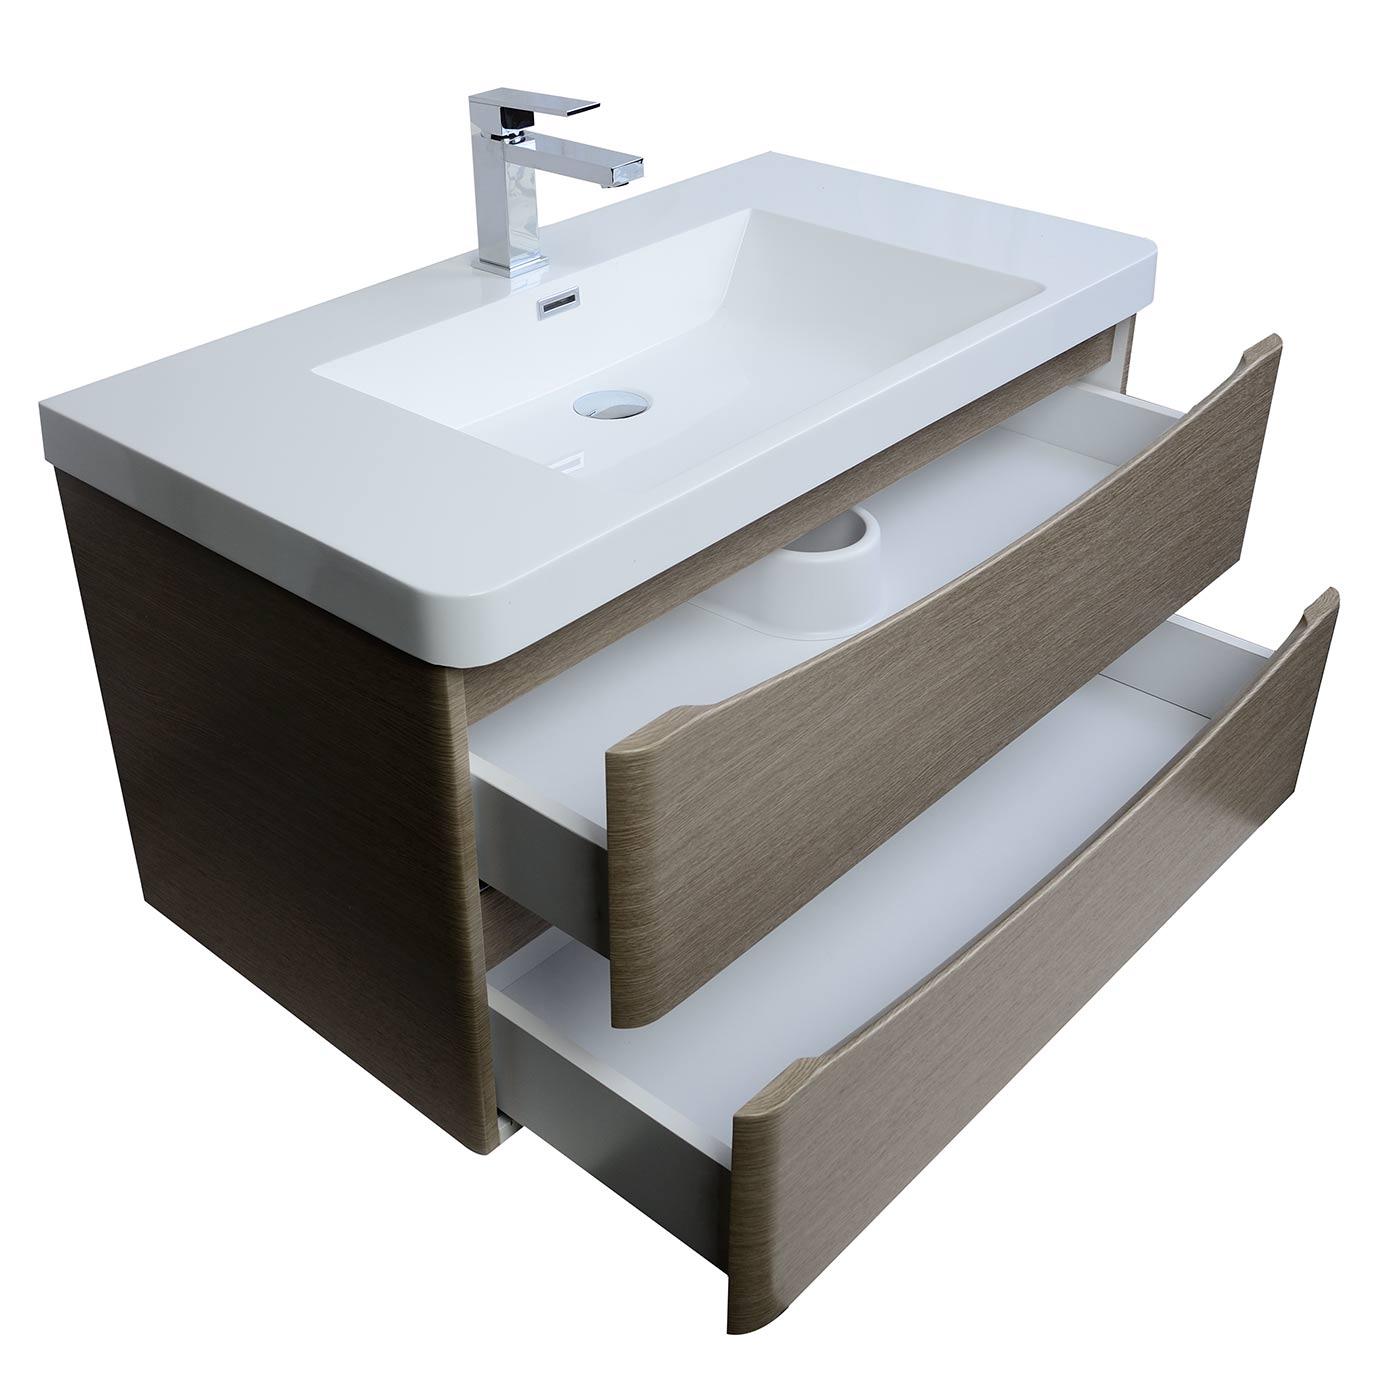 Merida 355 Inch WallMount Bathroom Vanity in Light Pine